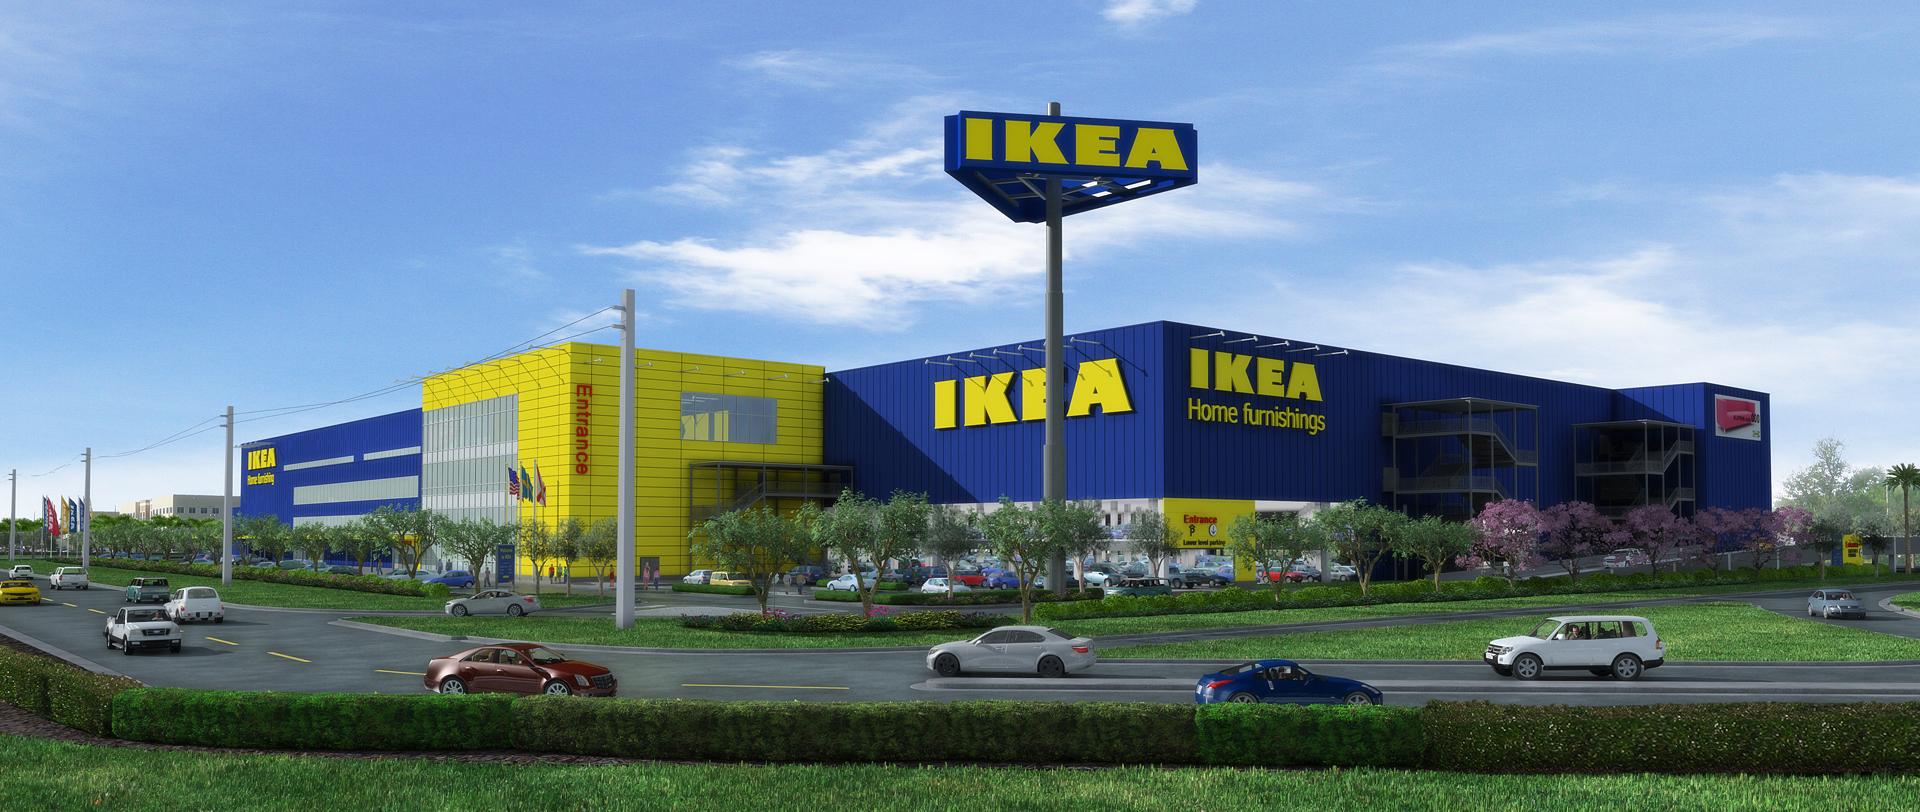 Expanding In Florida Swedish Home Furnishings Retailer Ikea Breaks